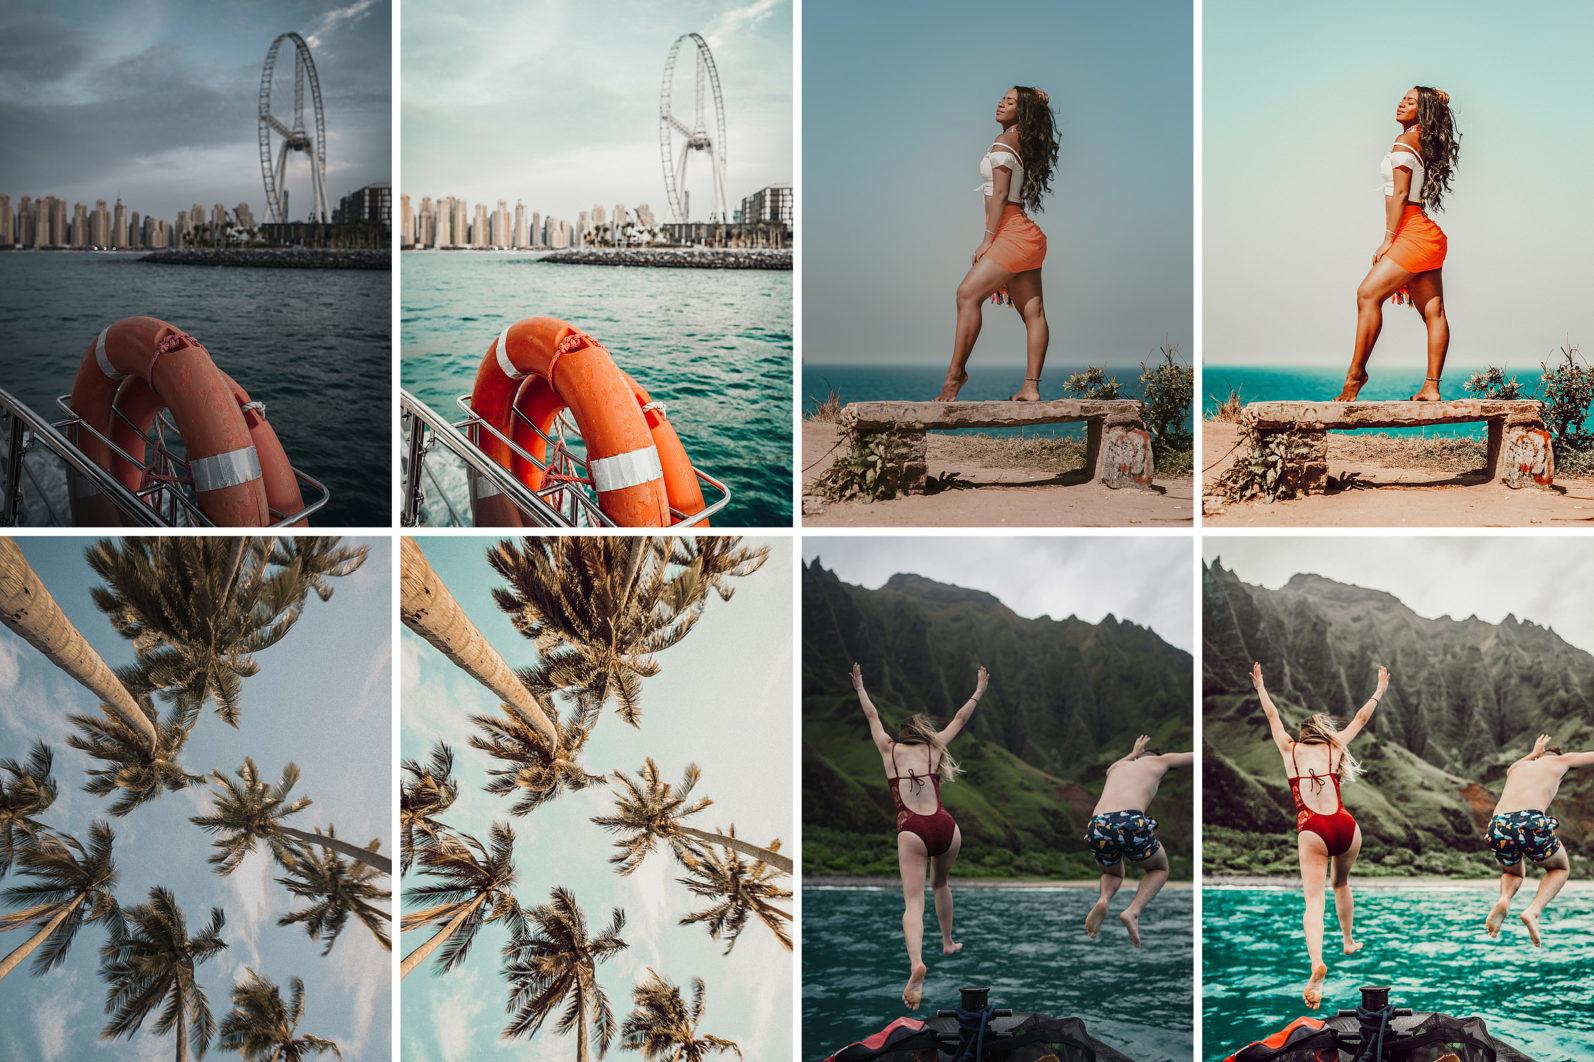 34. Summer Island - 34.SUMMERISLAND 02 -